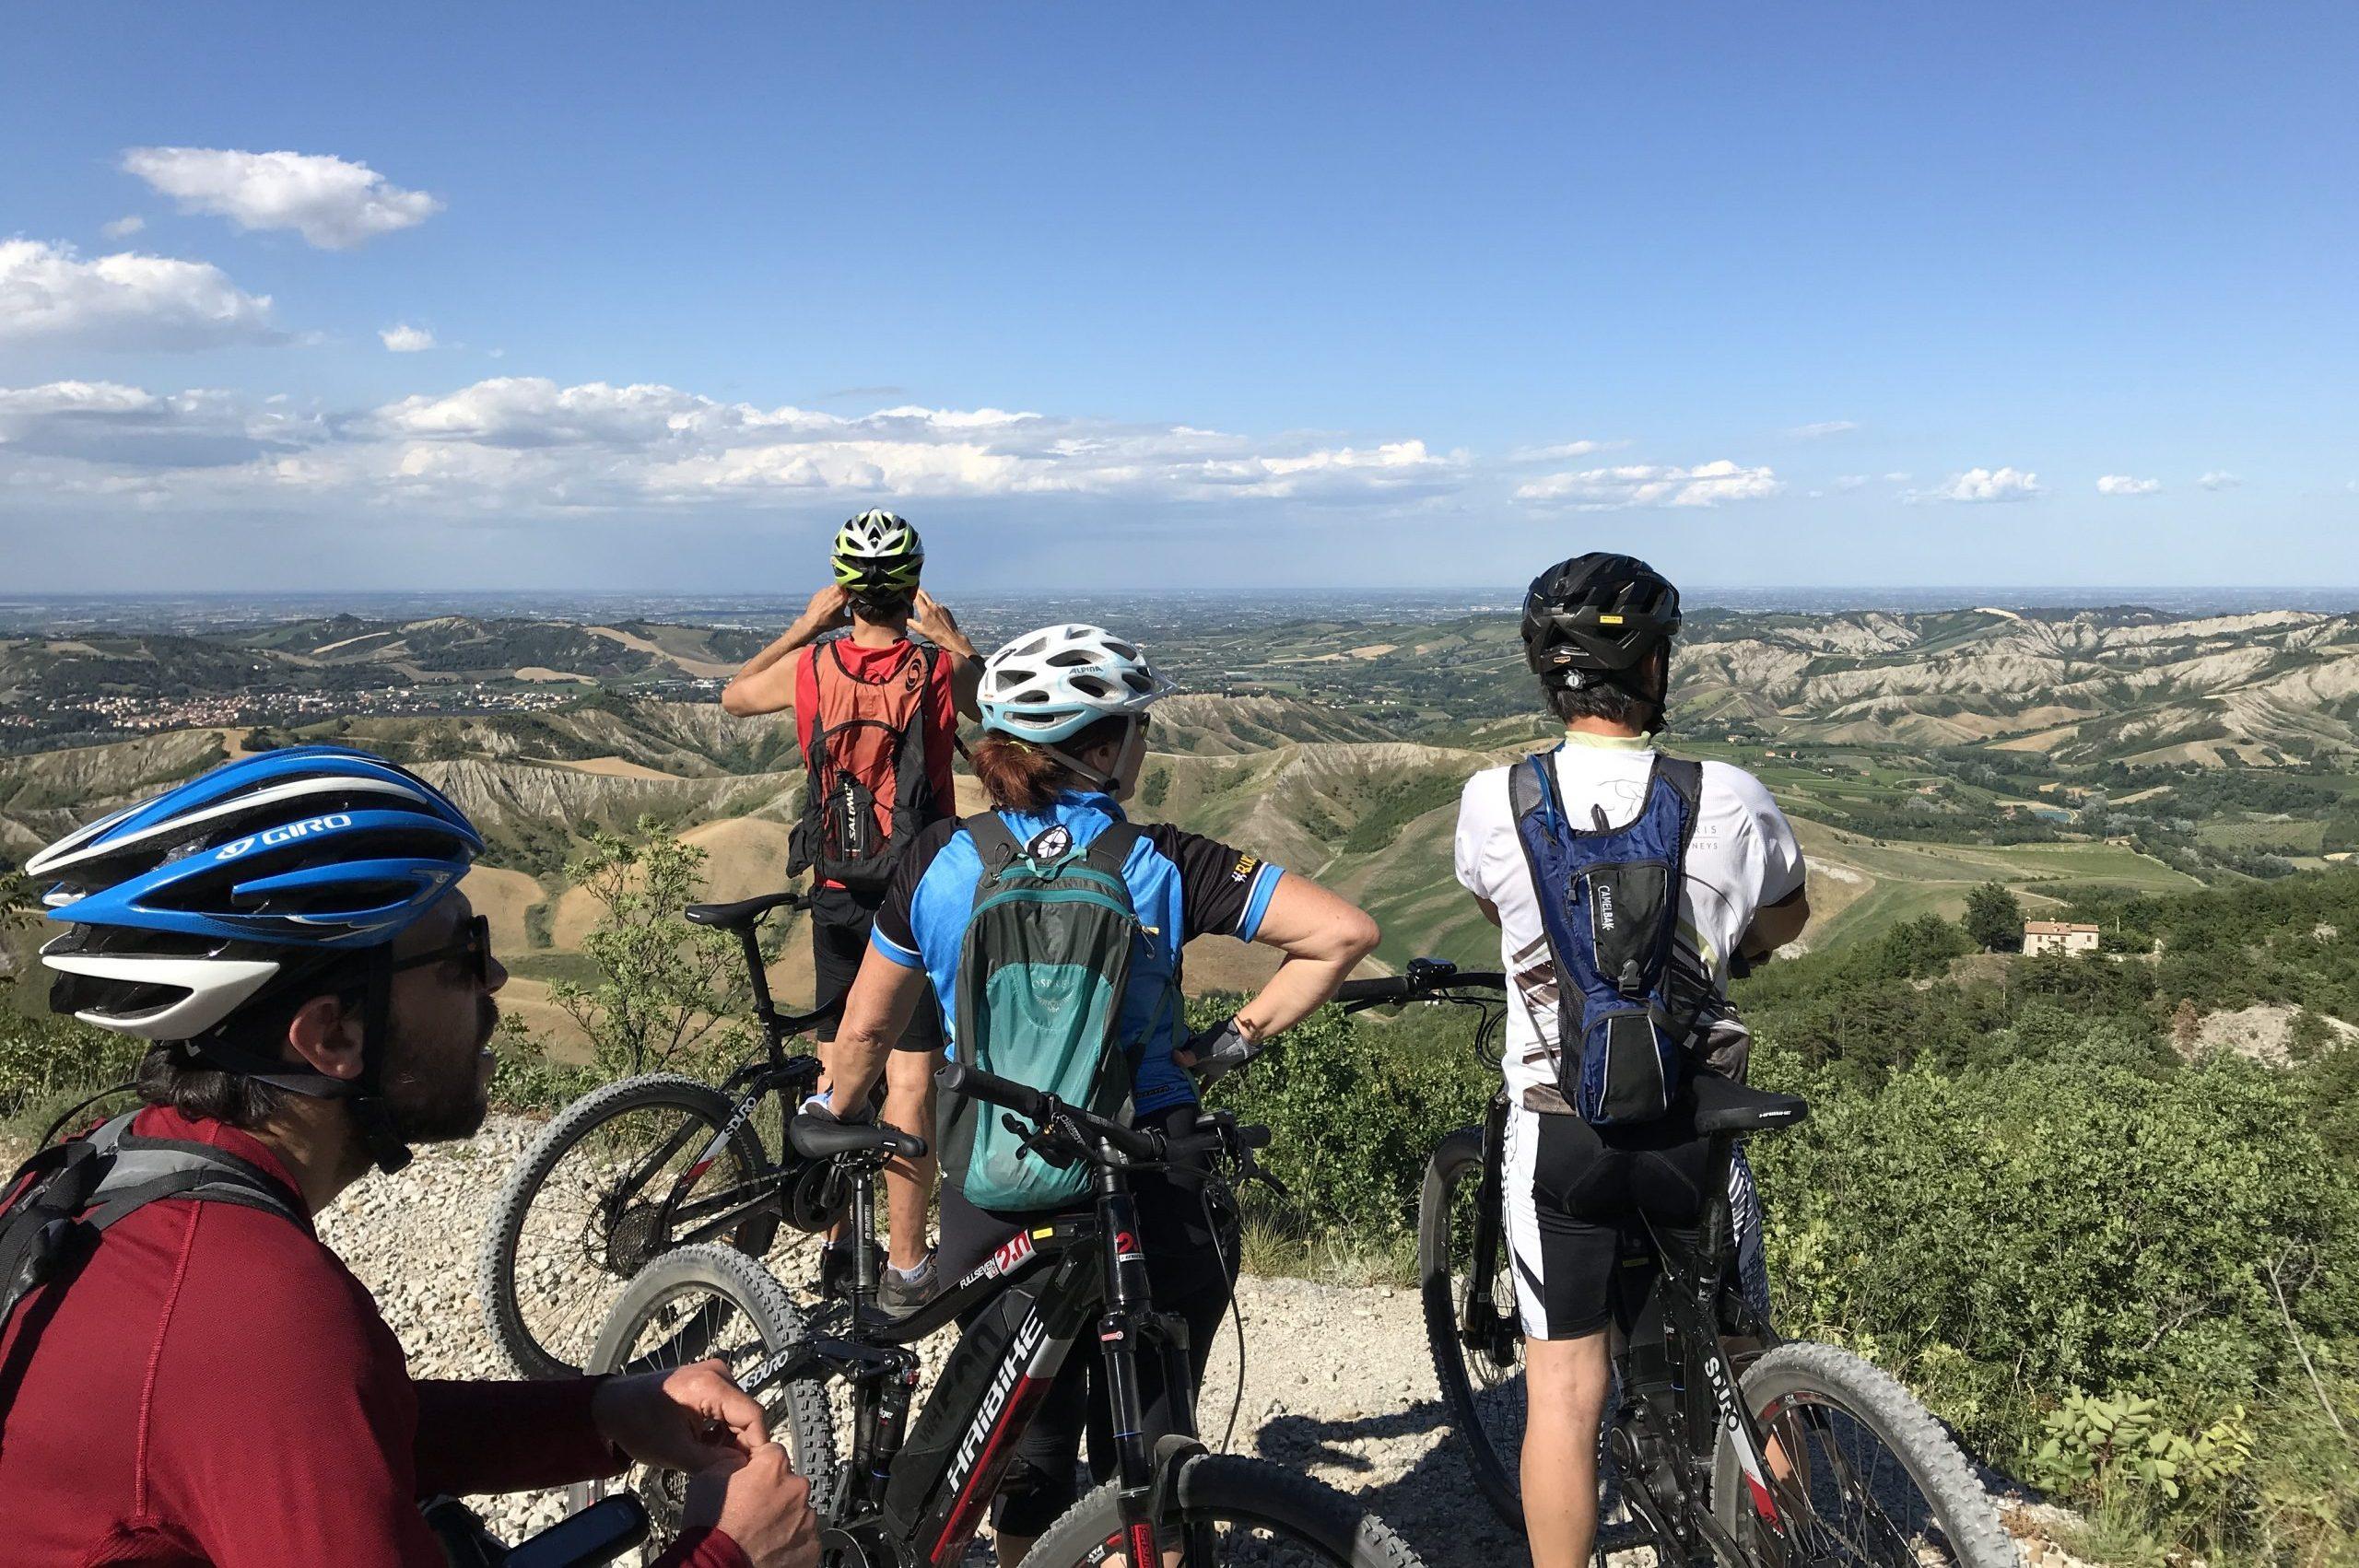 Ciclisti a Ravenna